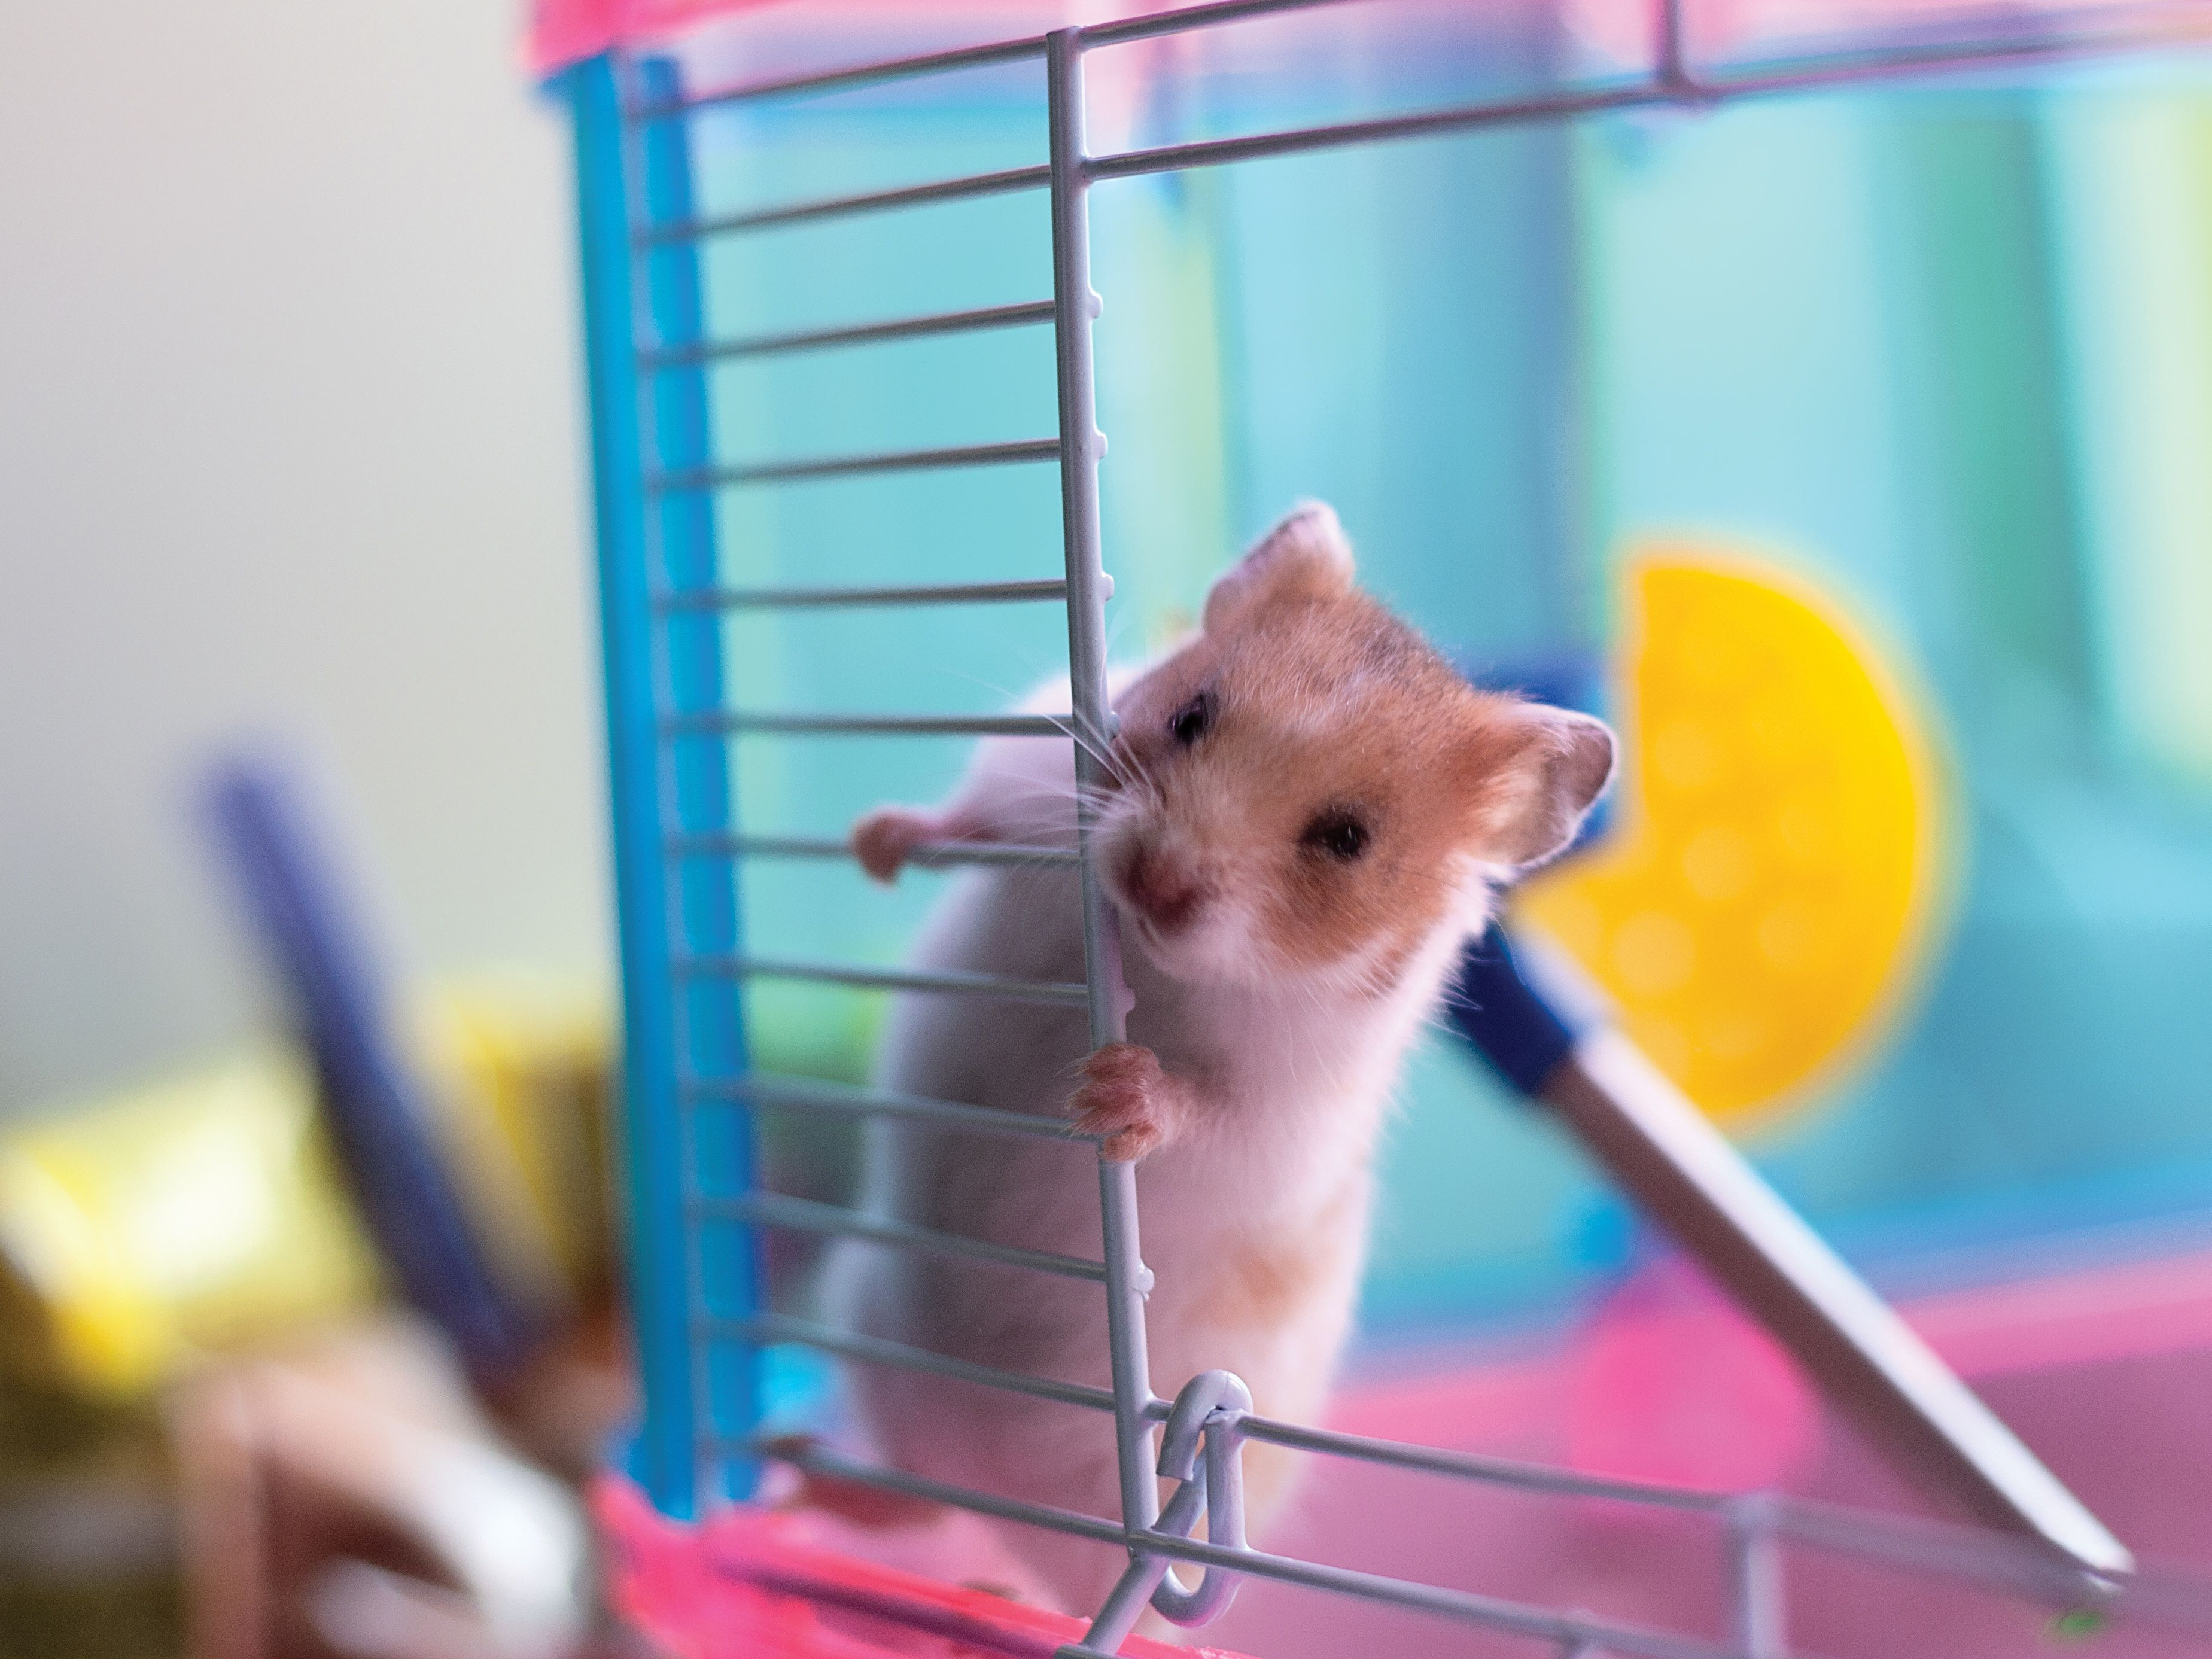 Do Mice Make Good Pets for Children?